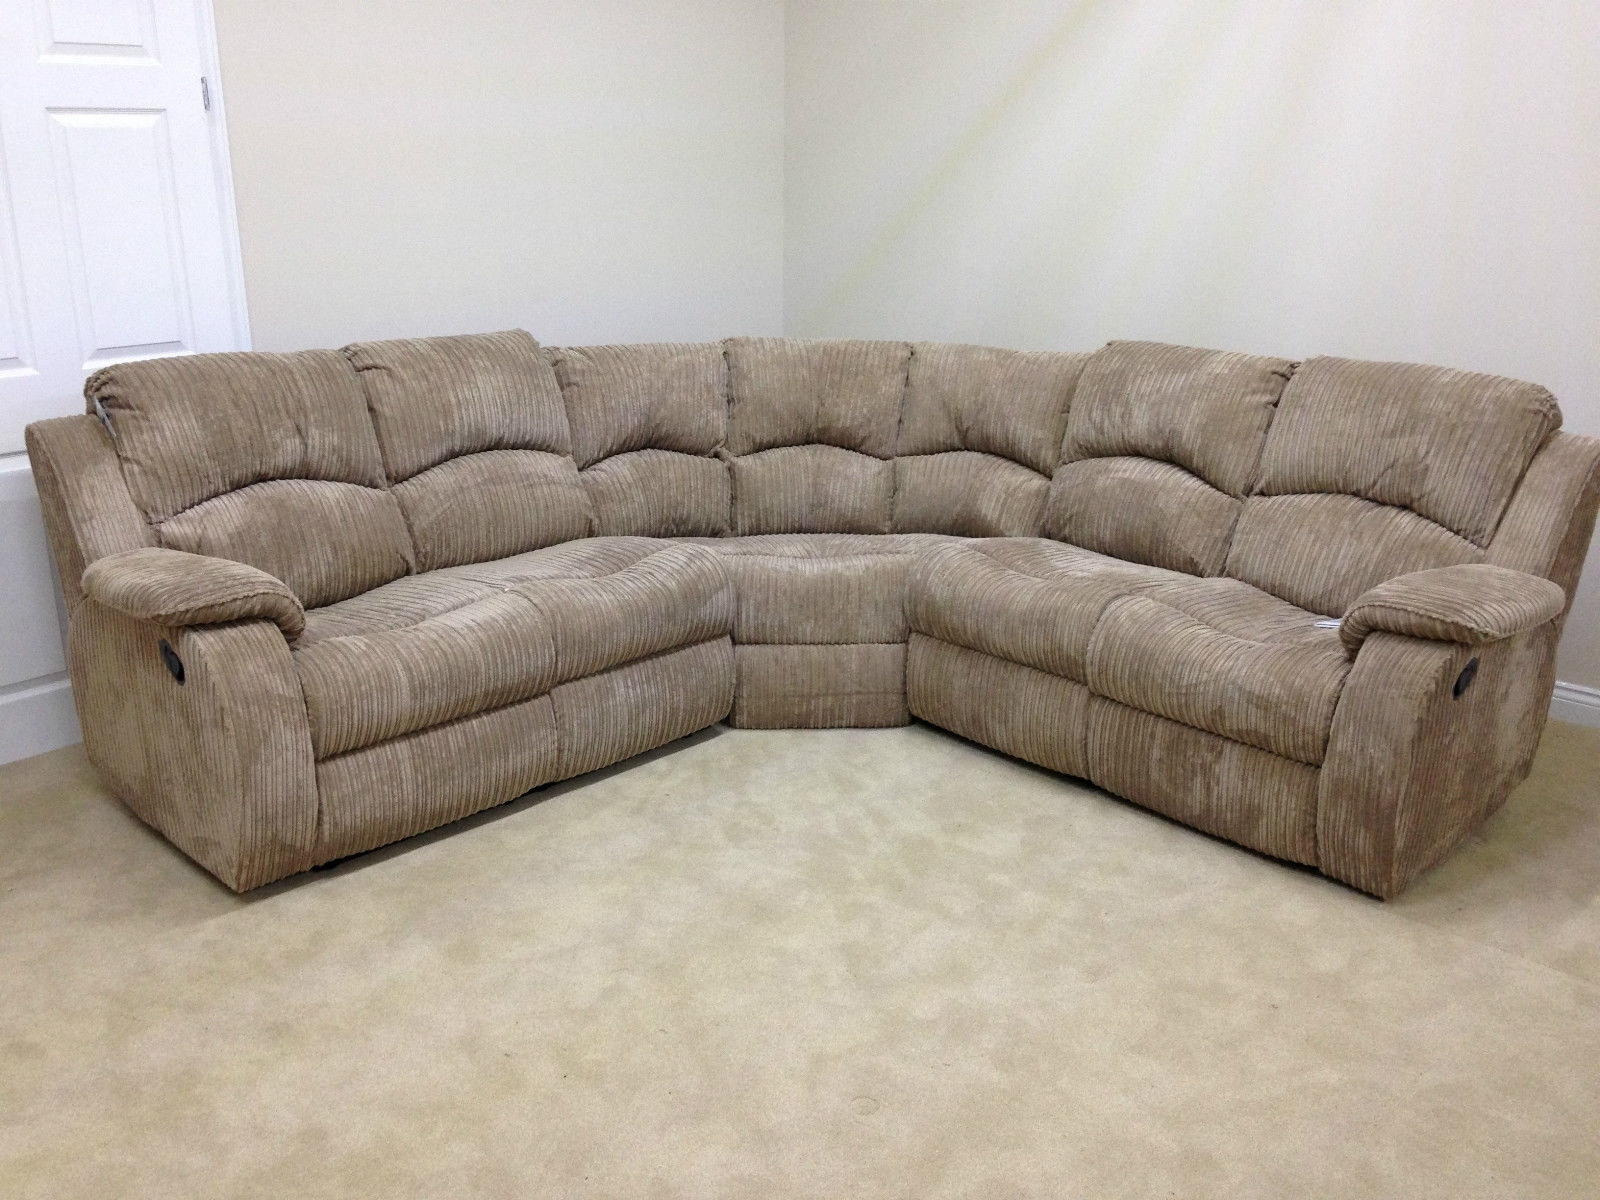 2019 Fabric Corner Sofas Regarding Csl Corner Sofa Fabric (Gallery 8 of 20)